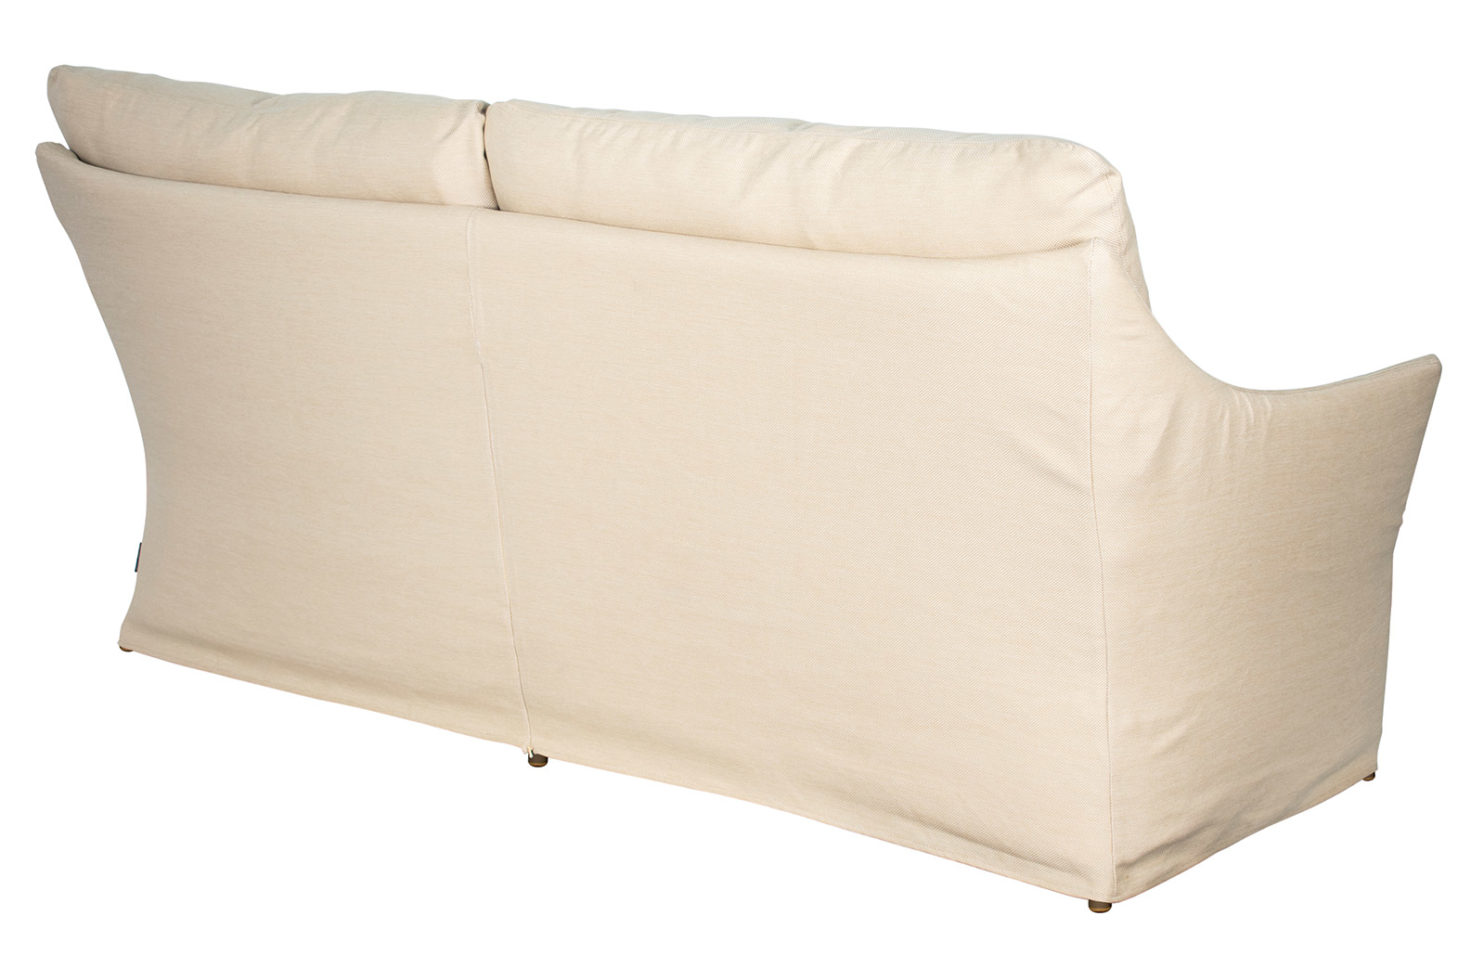 capri sofa 620FT094FC PW 1 3Q back